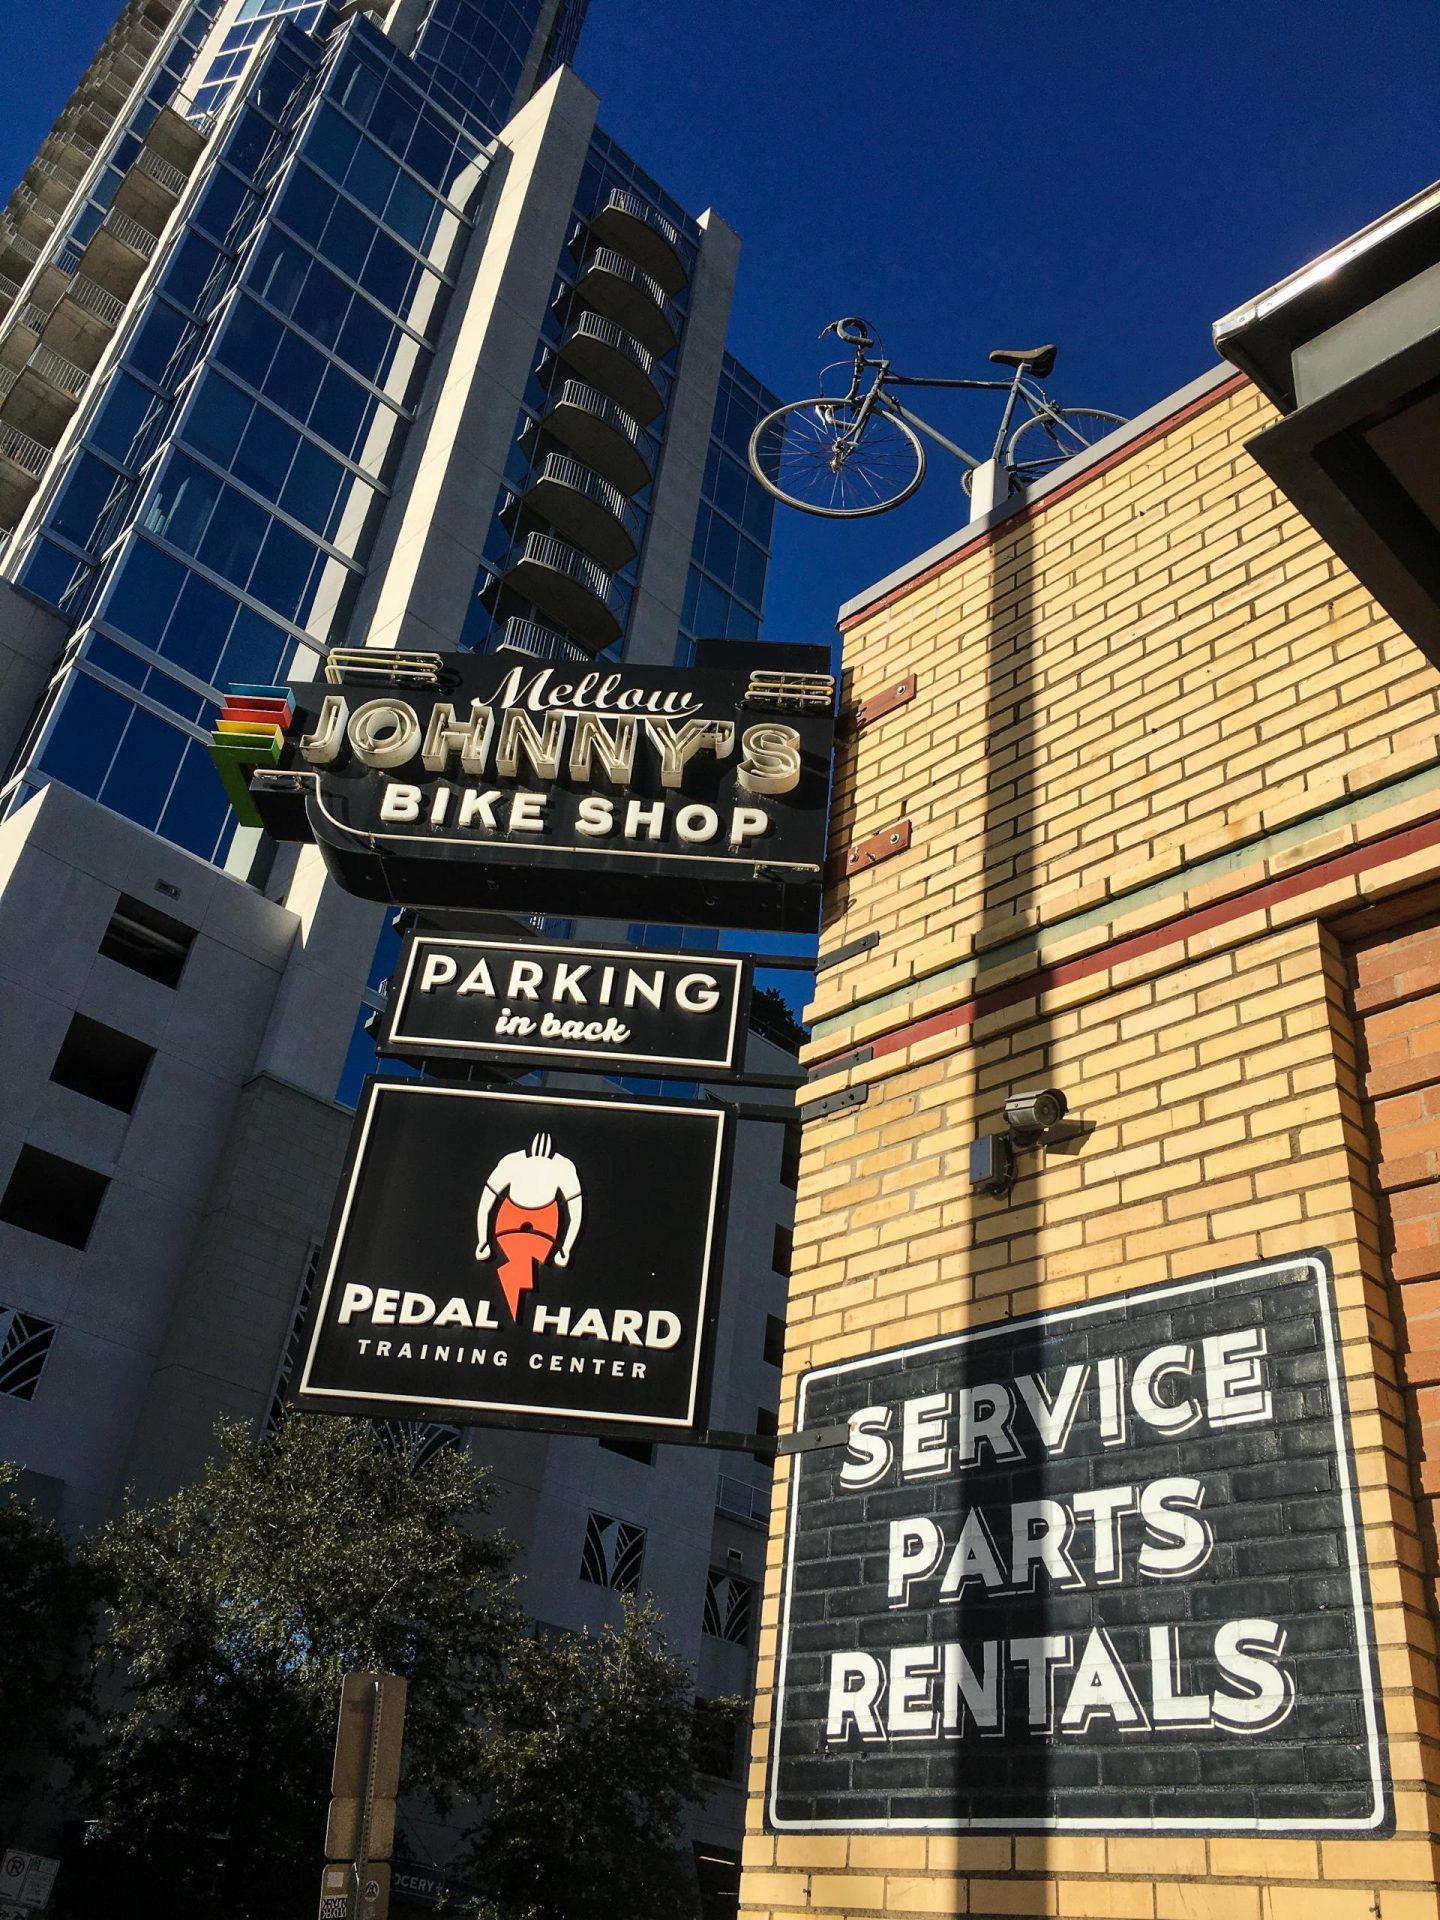 Lance Armstrong Bike Shop Cafe, Austin Texas - Rachel Nicole UK Travel Blogger